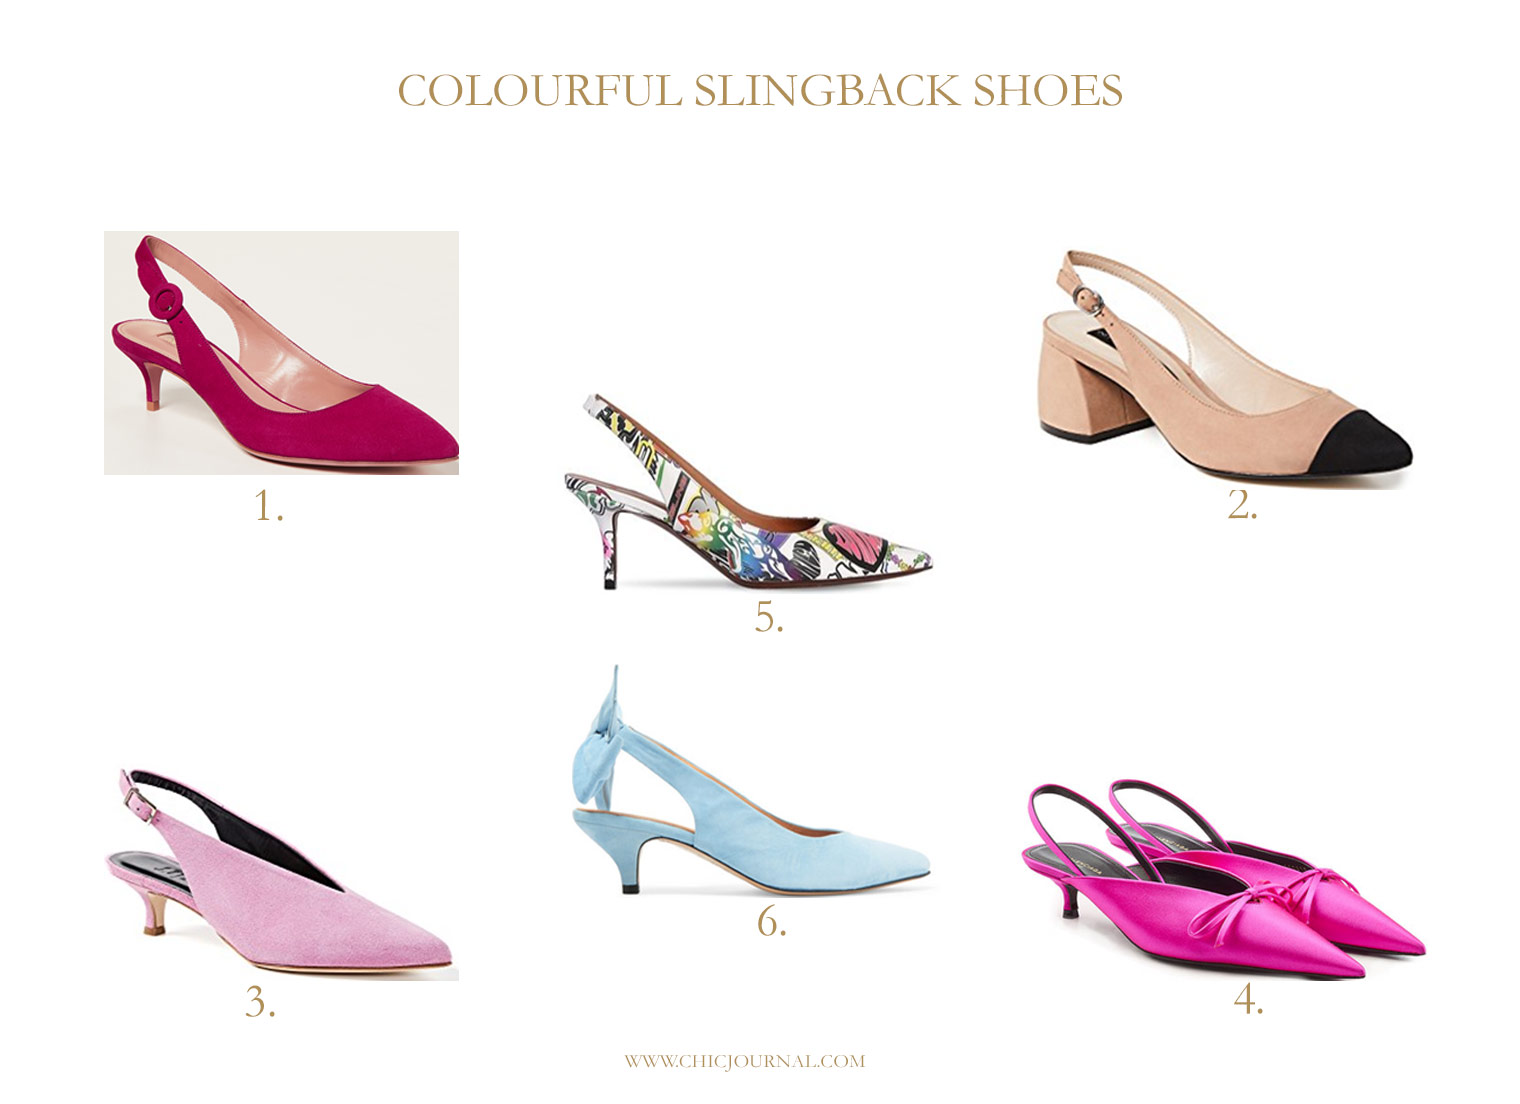 colourful slingback shoes, Balenciaga slingbacks, Vetements slingbacks, Ganni slingback shoes